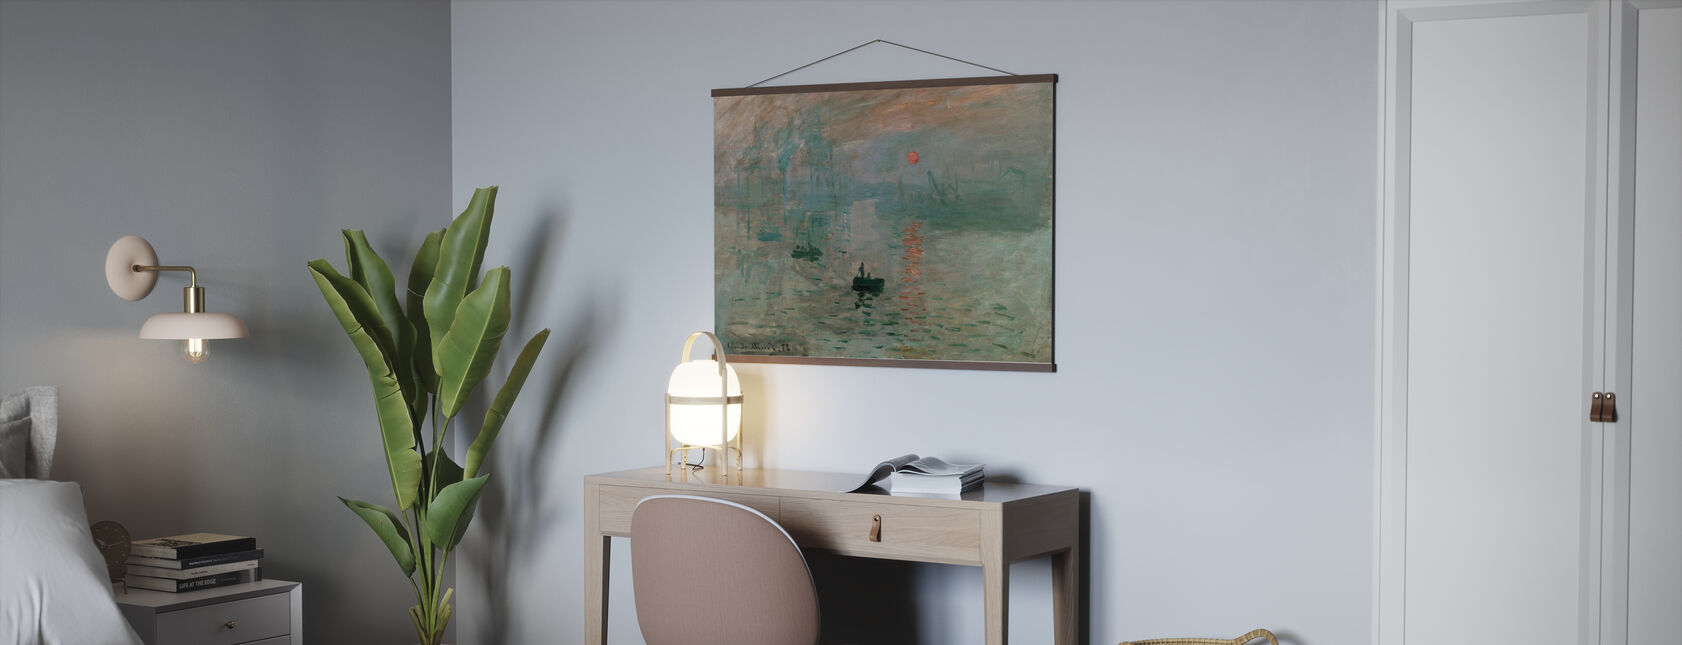 Monet, Claud - Impression - Juliste - Toimisto